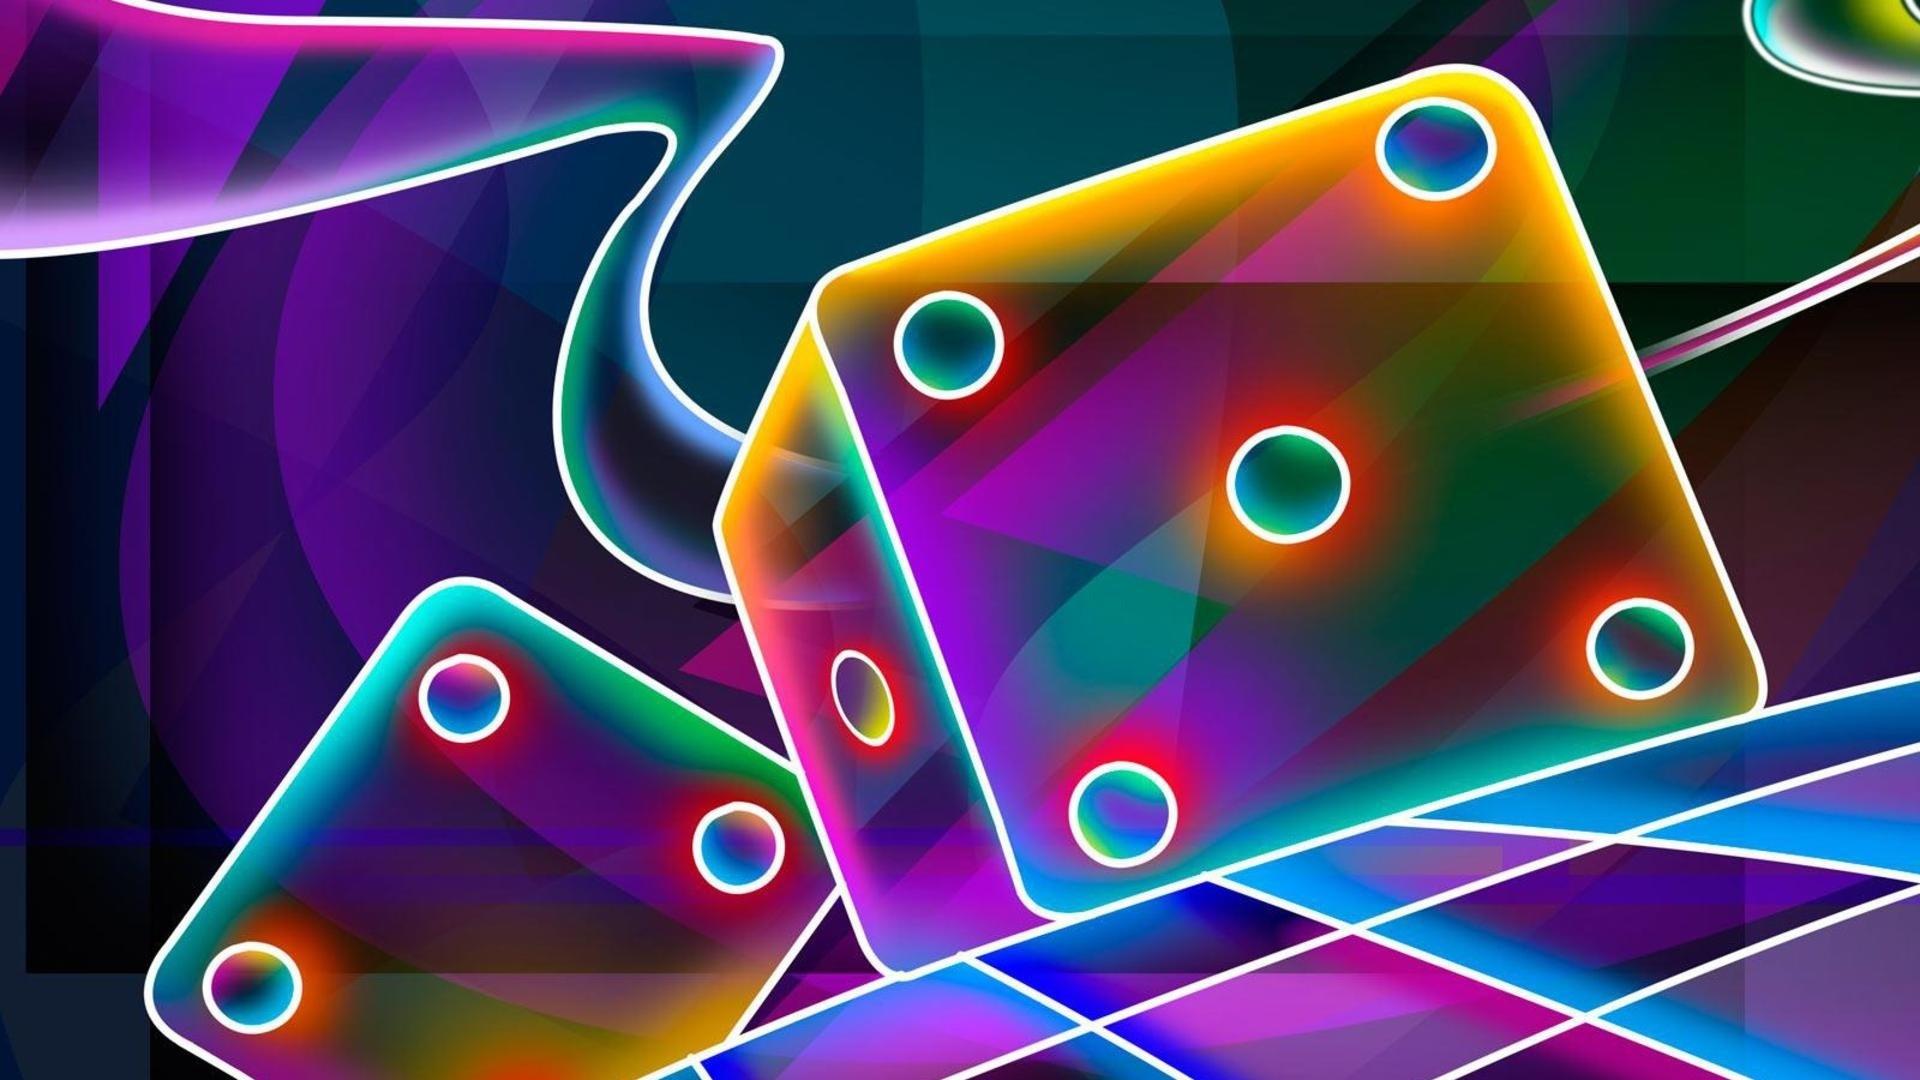 3D Full Hd Wallpapers